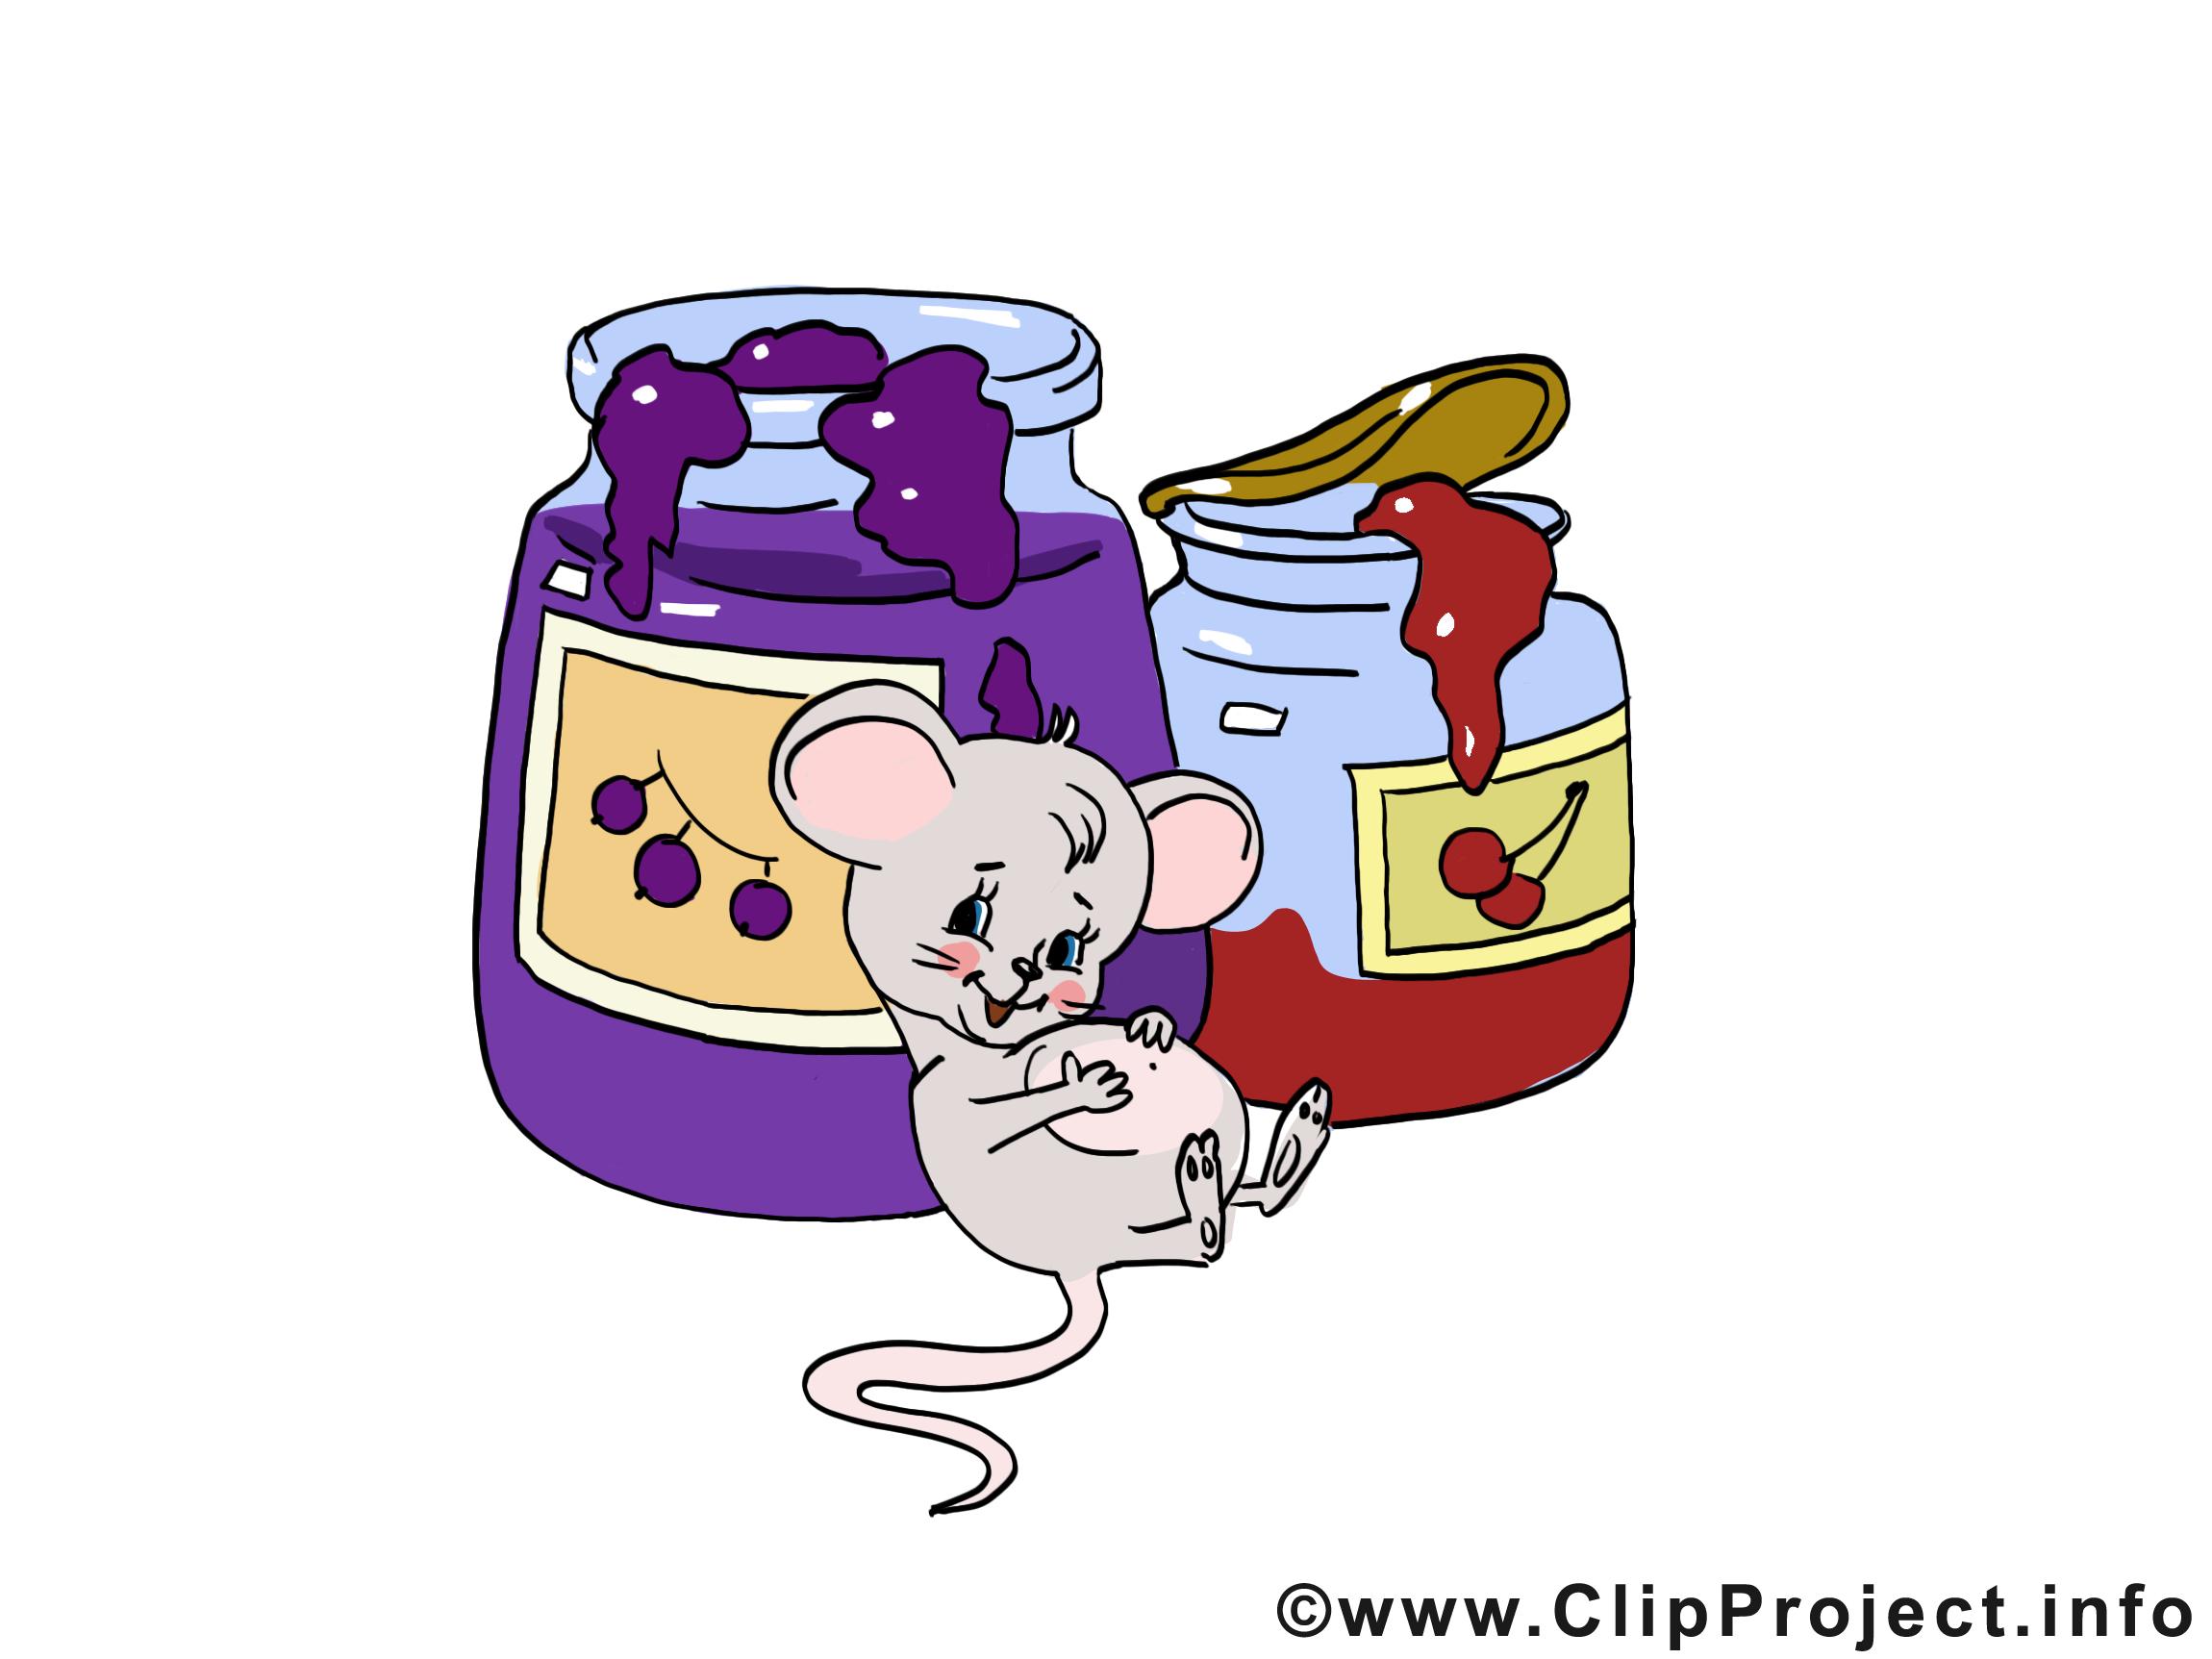 Souris illustration – Animal images